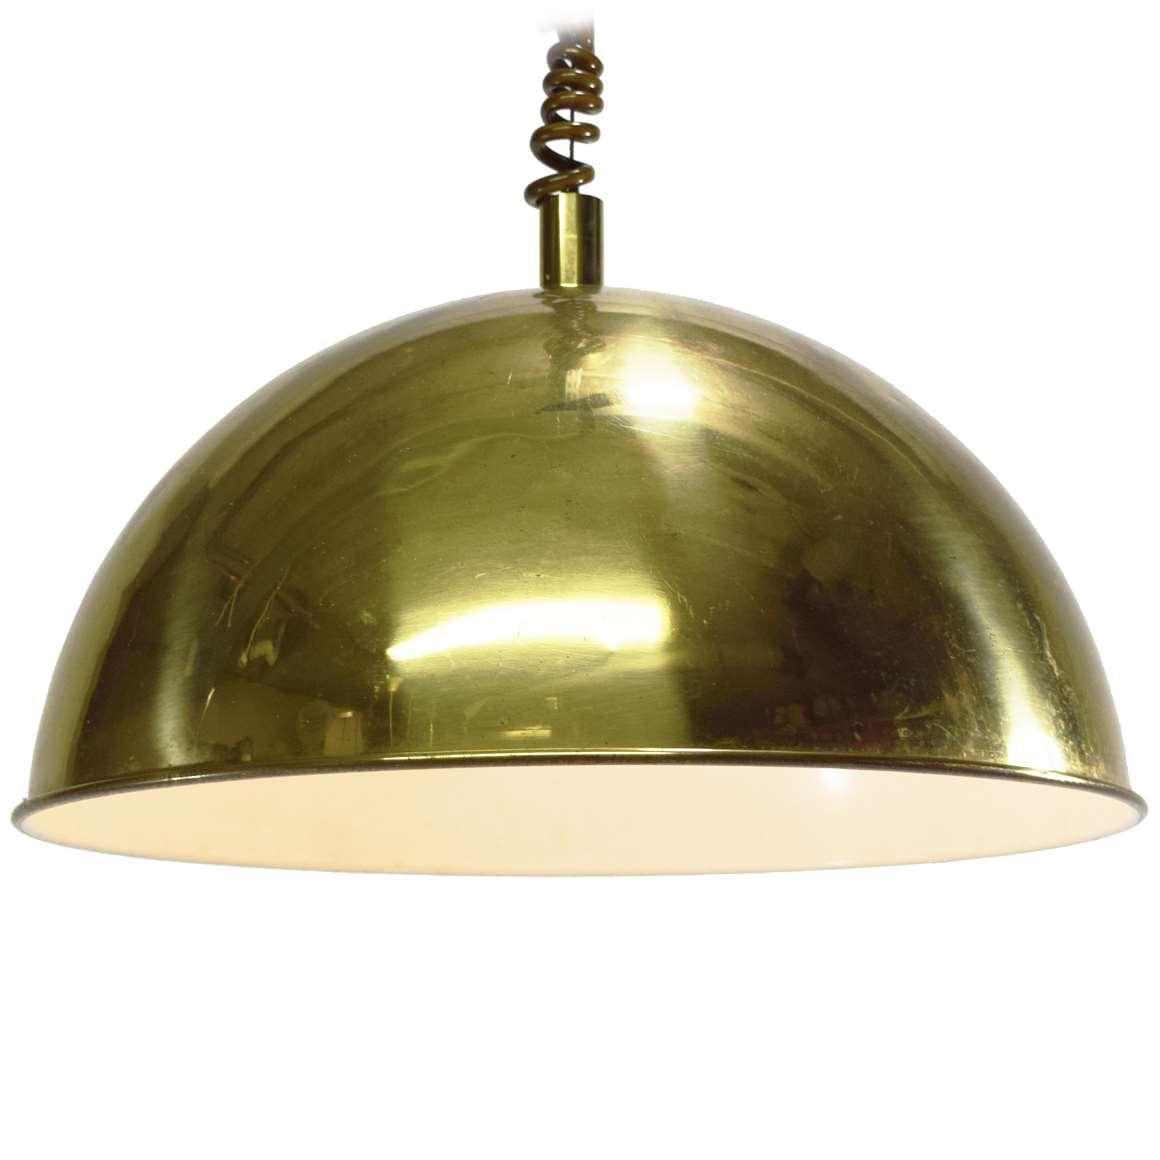 Brass Dome Pendant Light Vintage Info All About Vintage